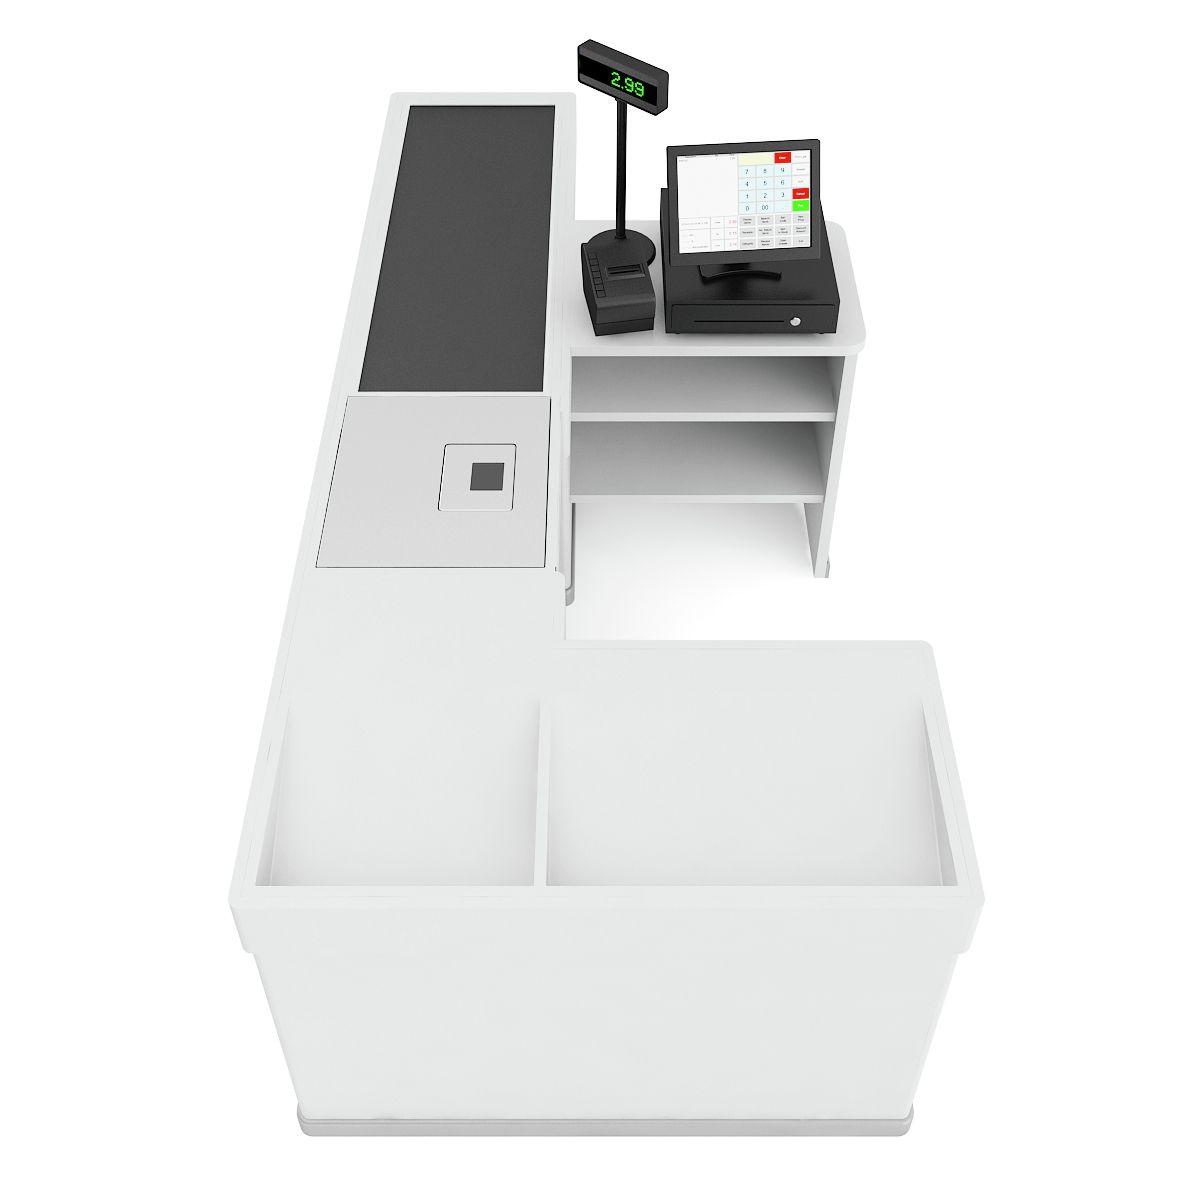 Cashier Desk  Grocery store design, Supermarket design, Store